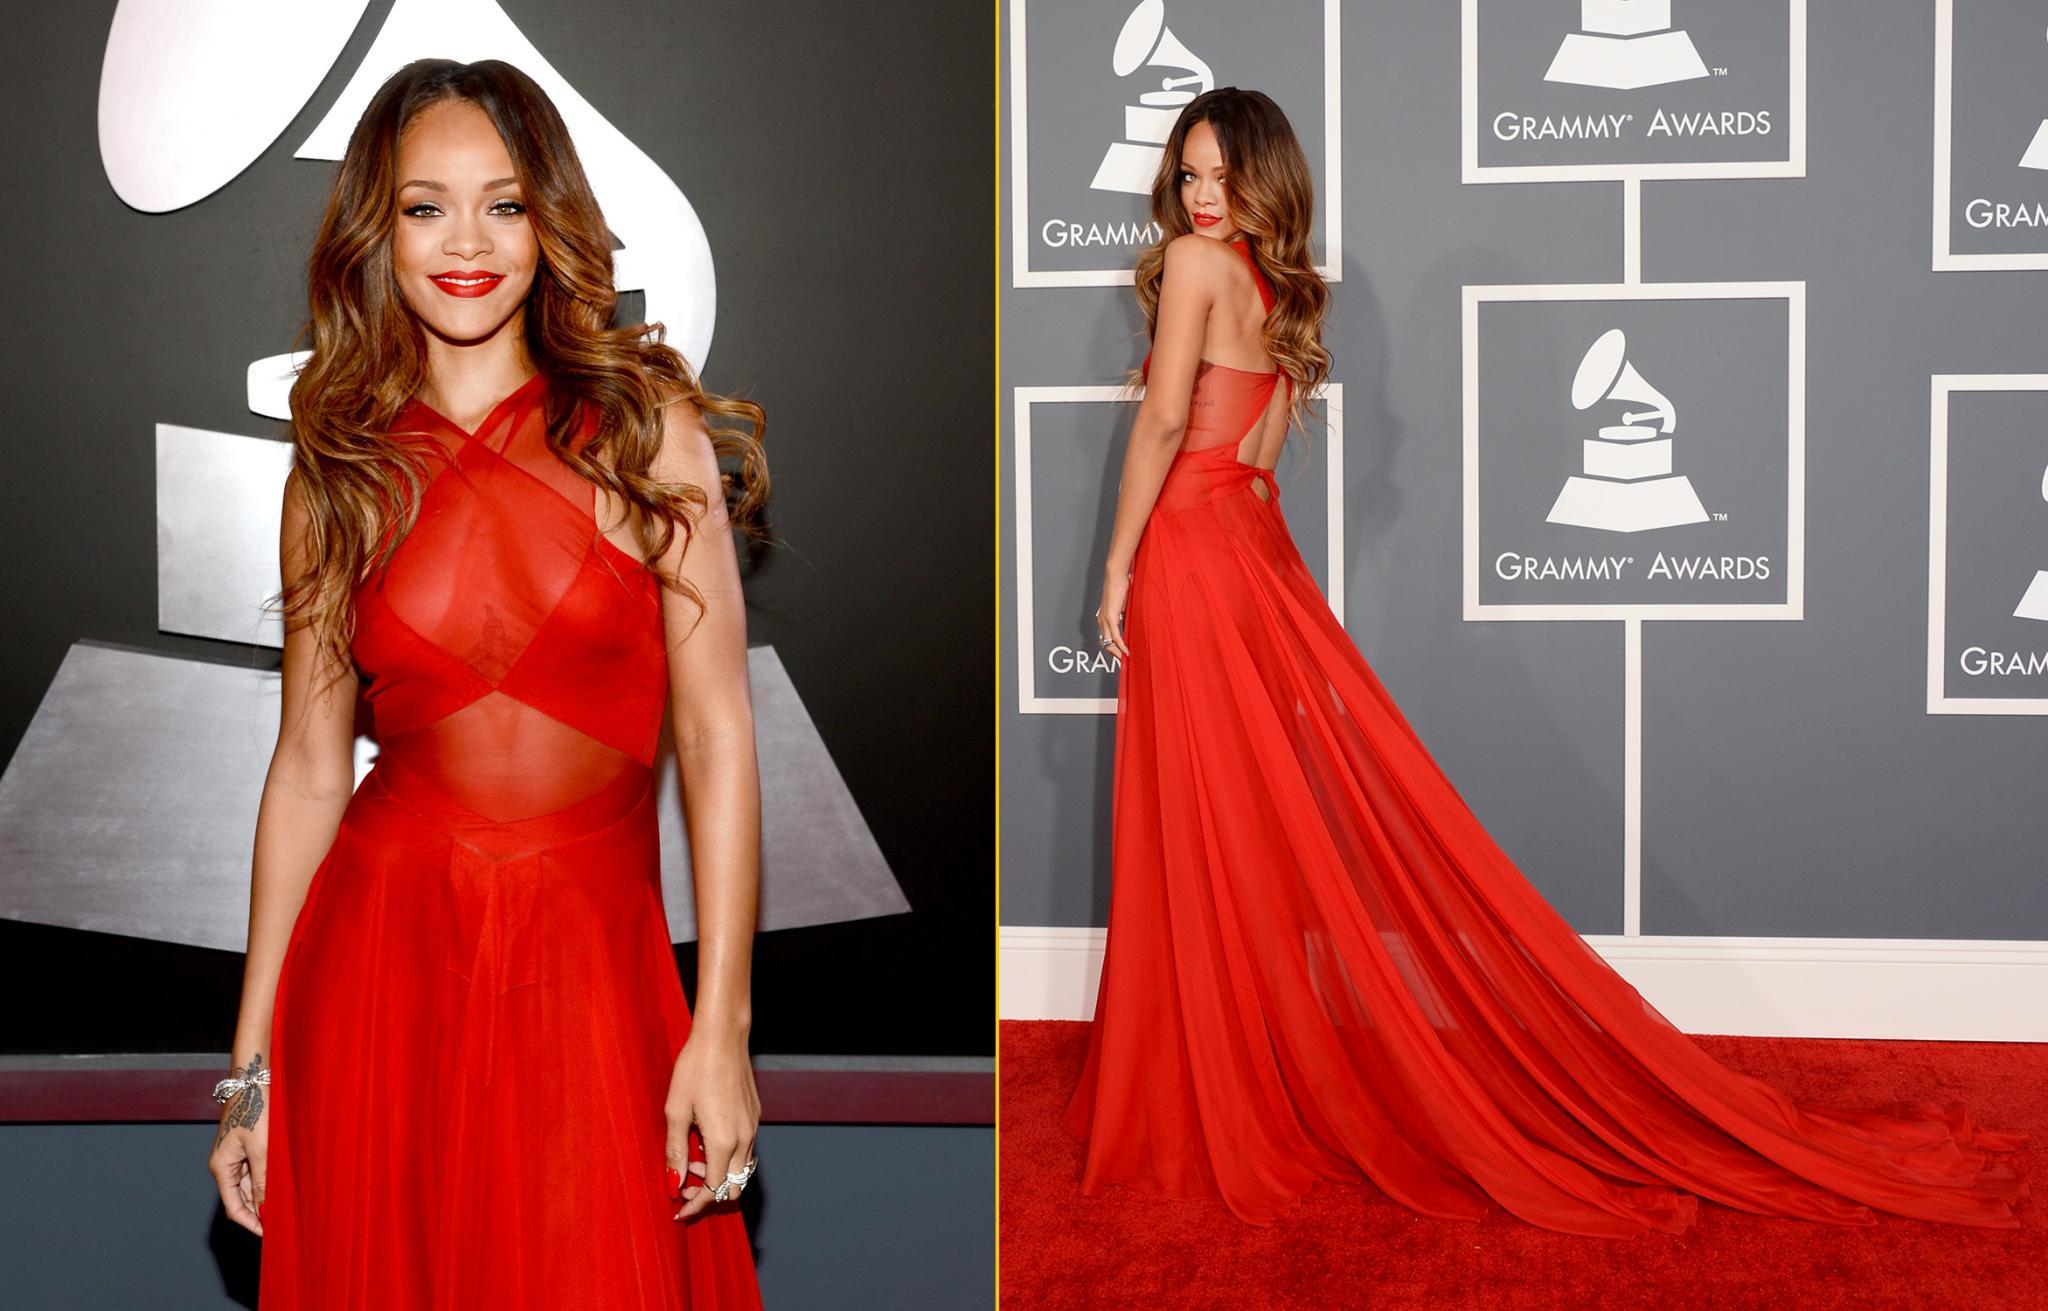 Grammys: Rihanna's Best Fashion Moments